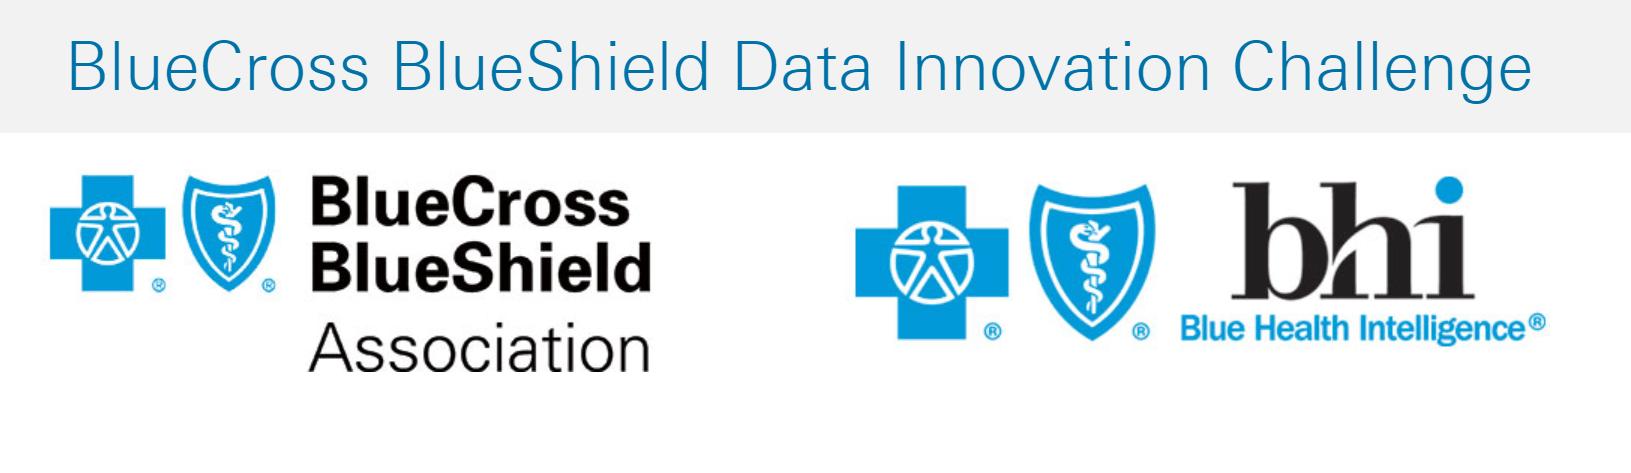 Blue Cross Blue Shield Bhi Launches Data Innovation Challenge